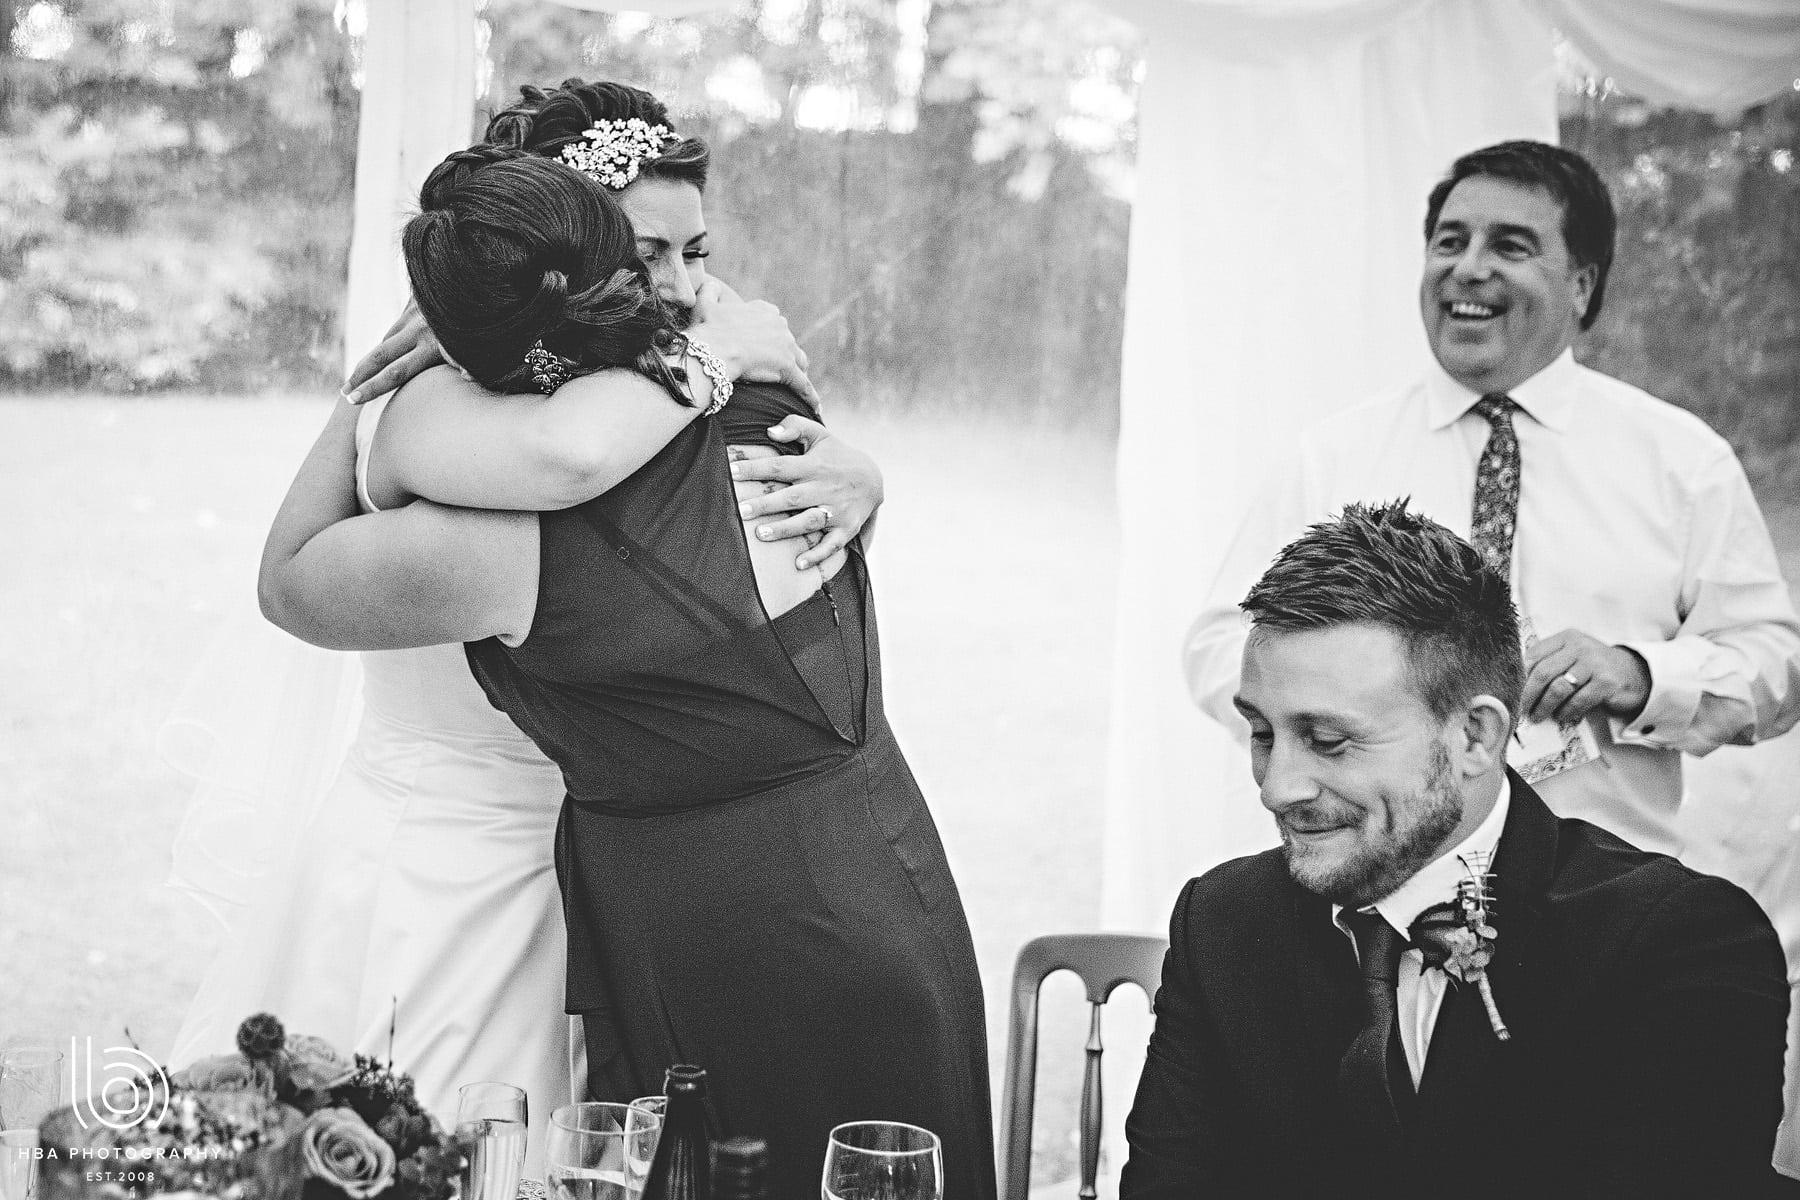 the bride hugging her bridesmaid